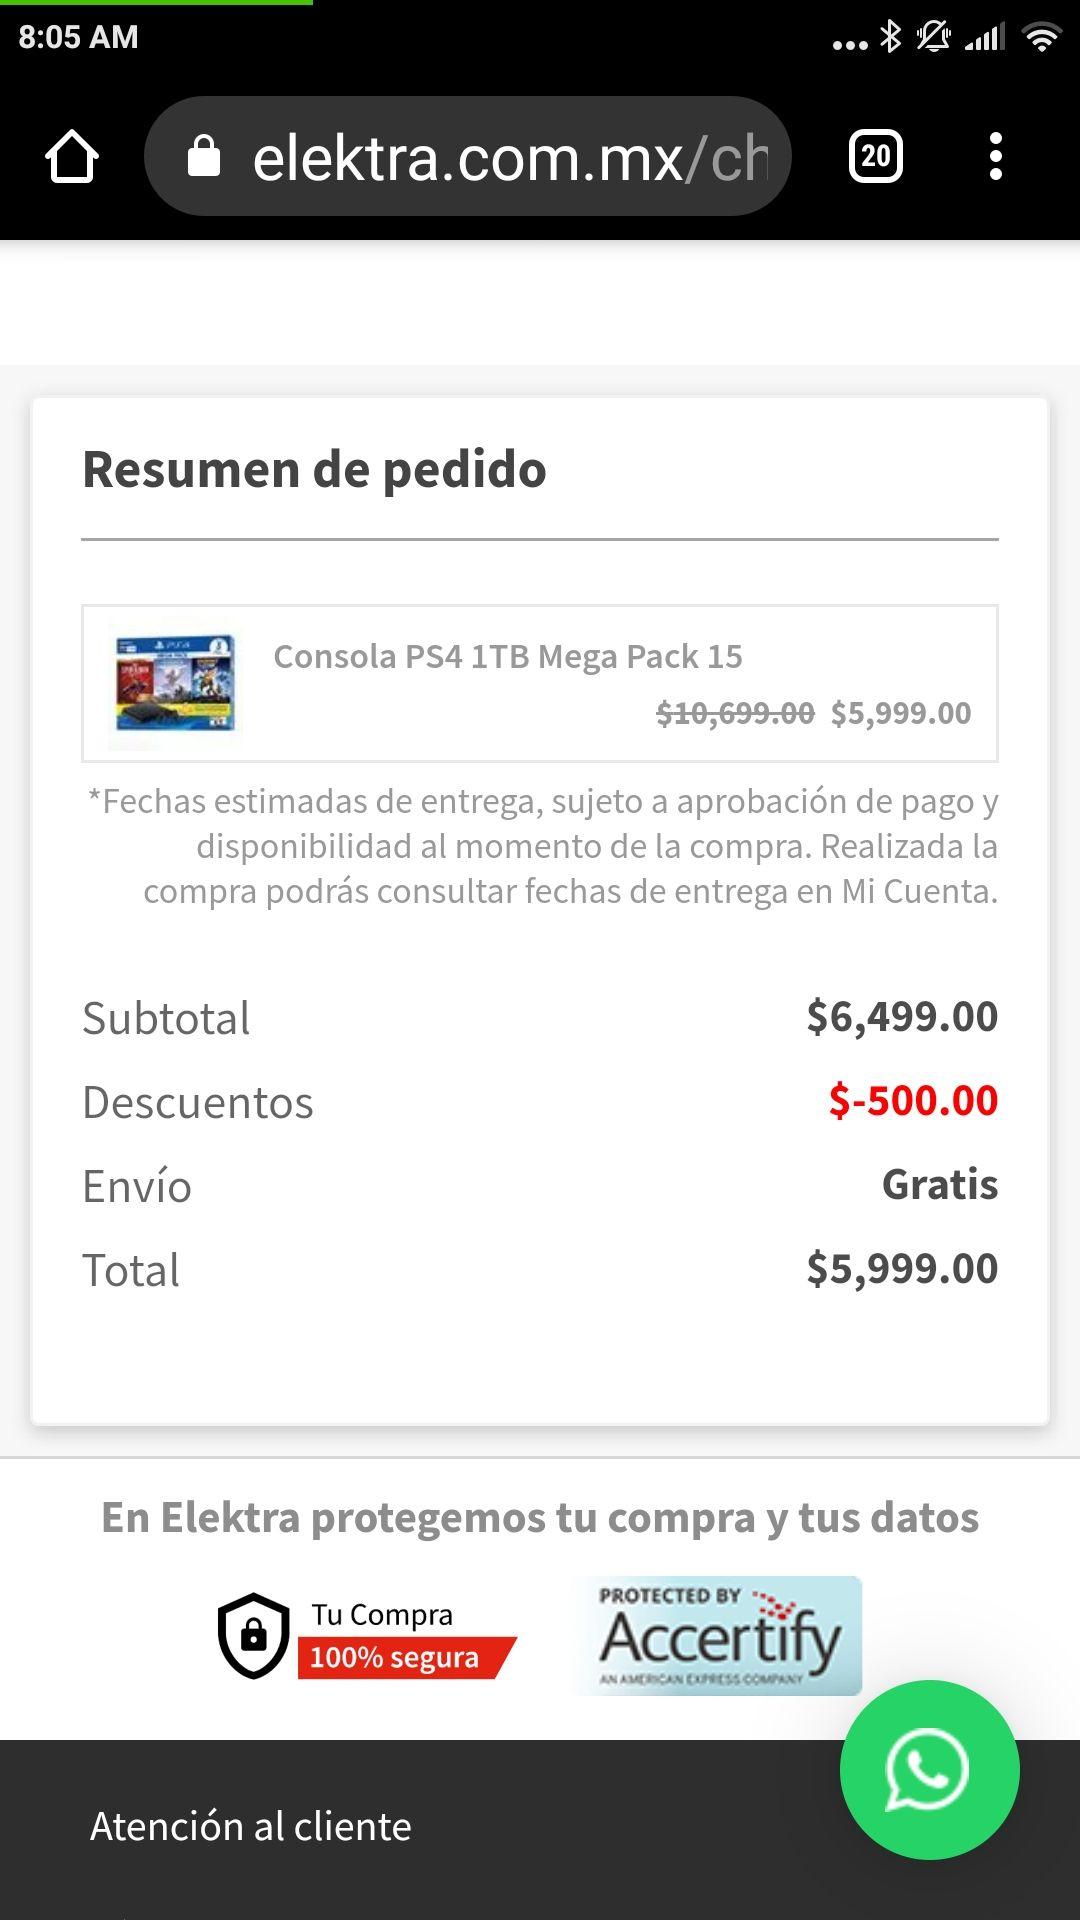 Elektra: consola Ps4 megapack pagando con Paypal-Santander